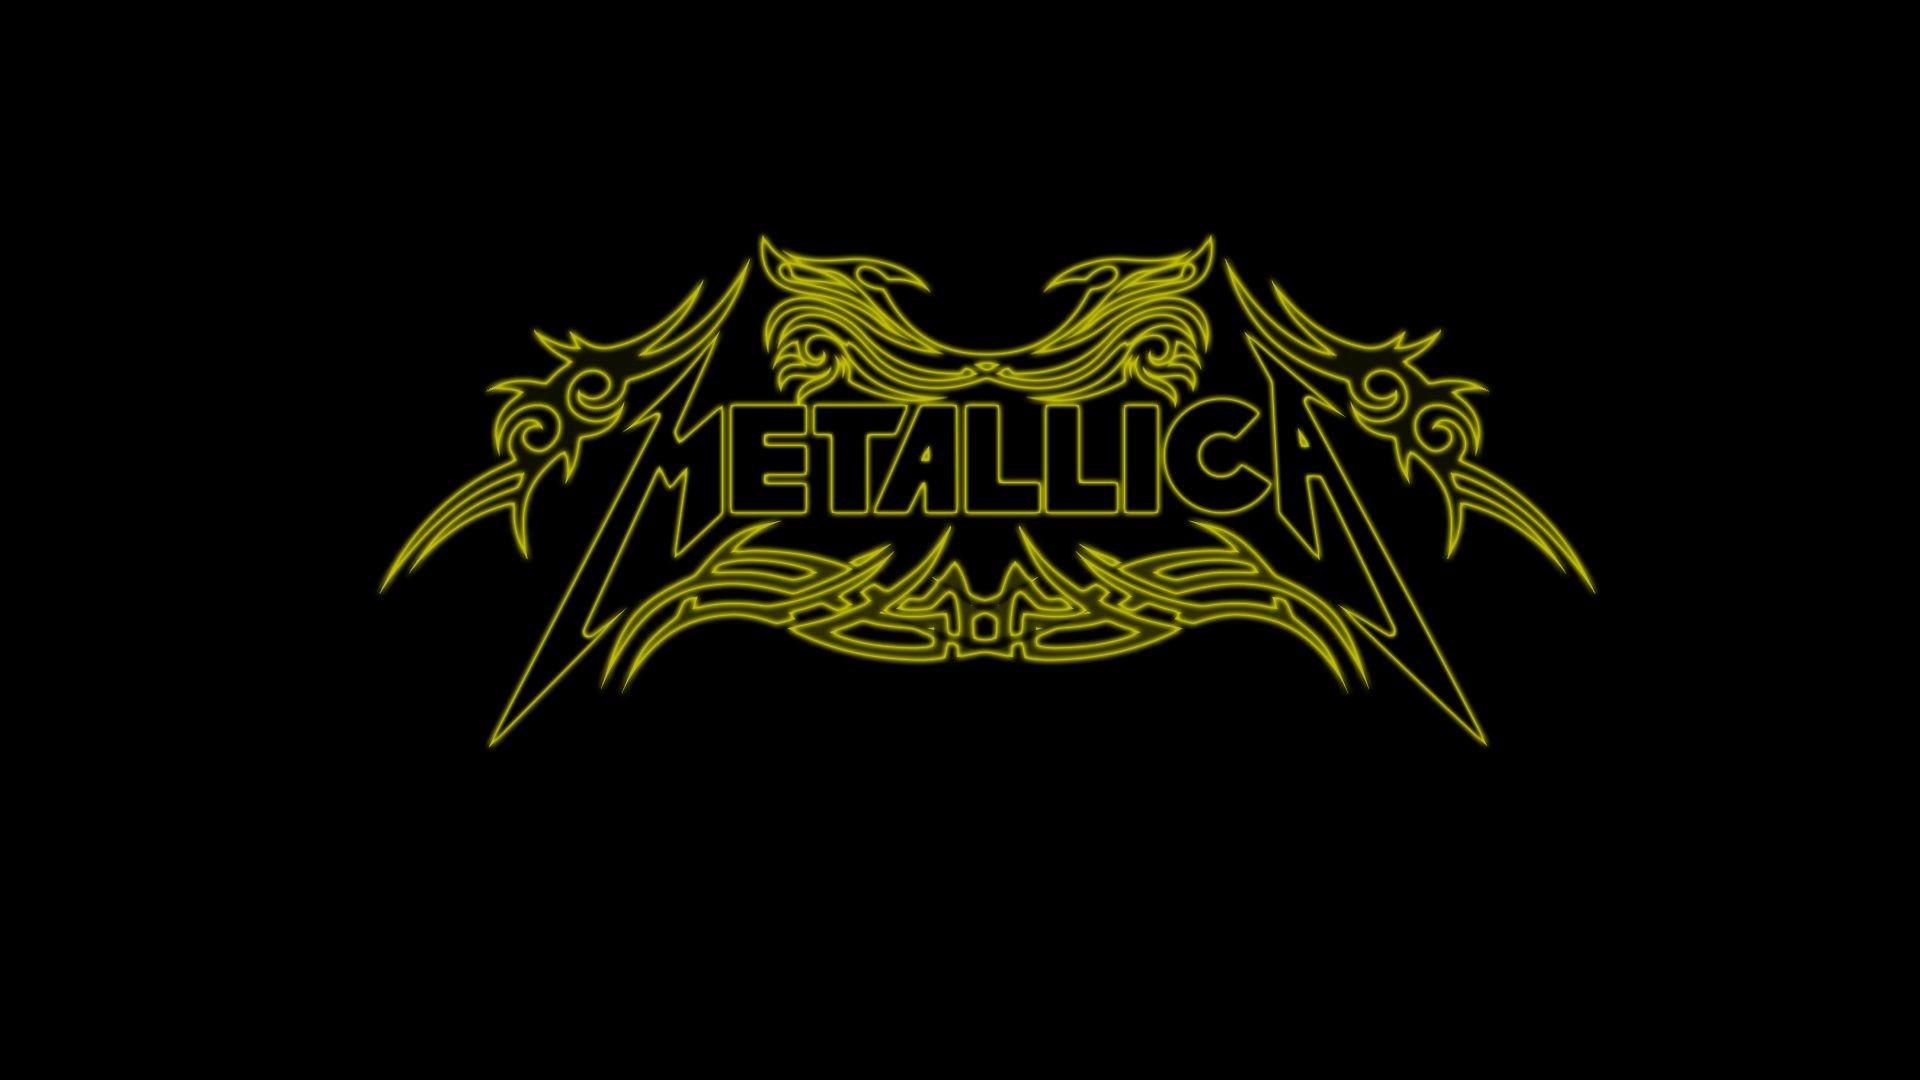 Res: 1920x1080, Metallica Wallpaper Widescreen